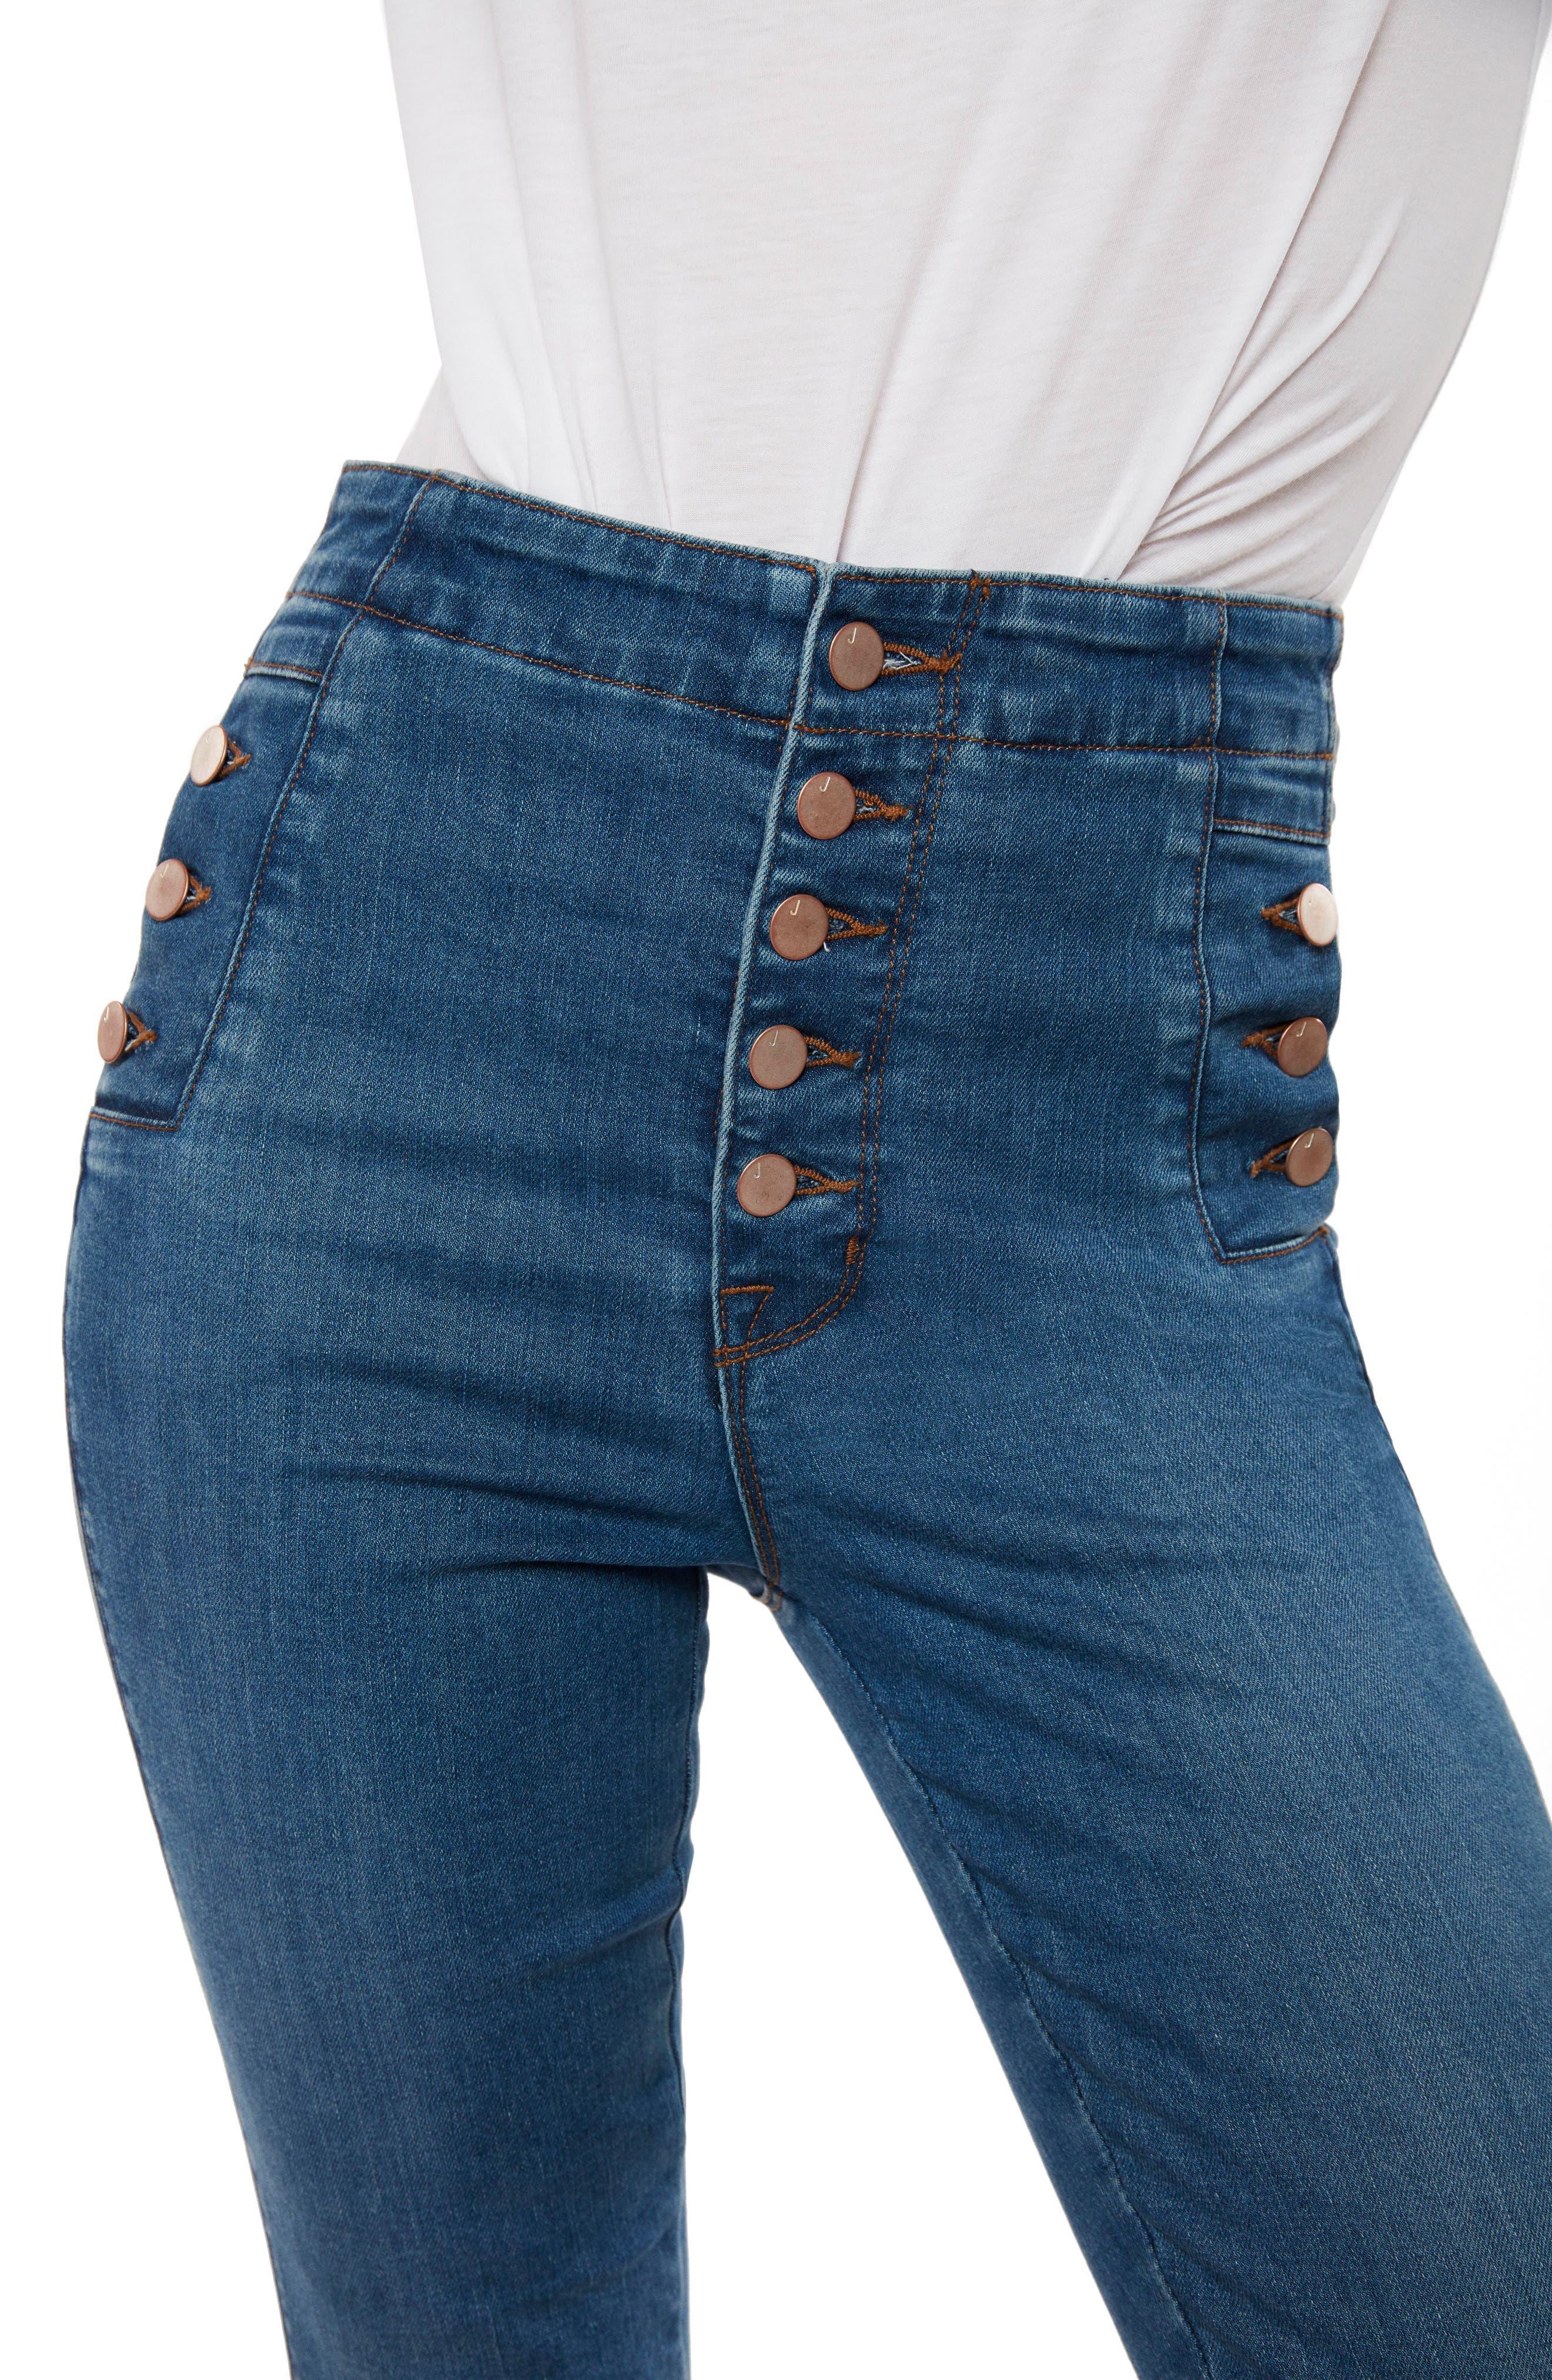 Natasha Sky High High Waist Crop Skinny Jeans,                             Alternate thumbnail 4, color,                             LOVESICK